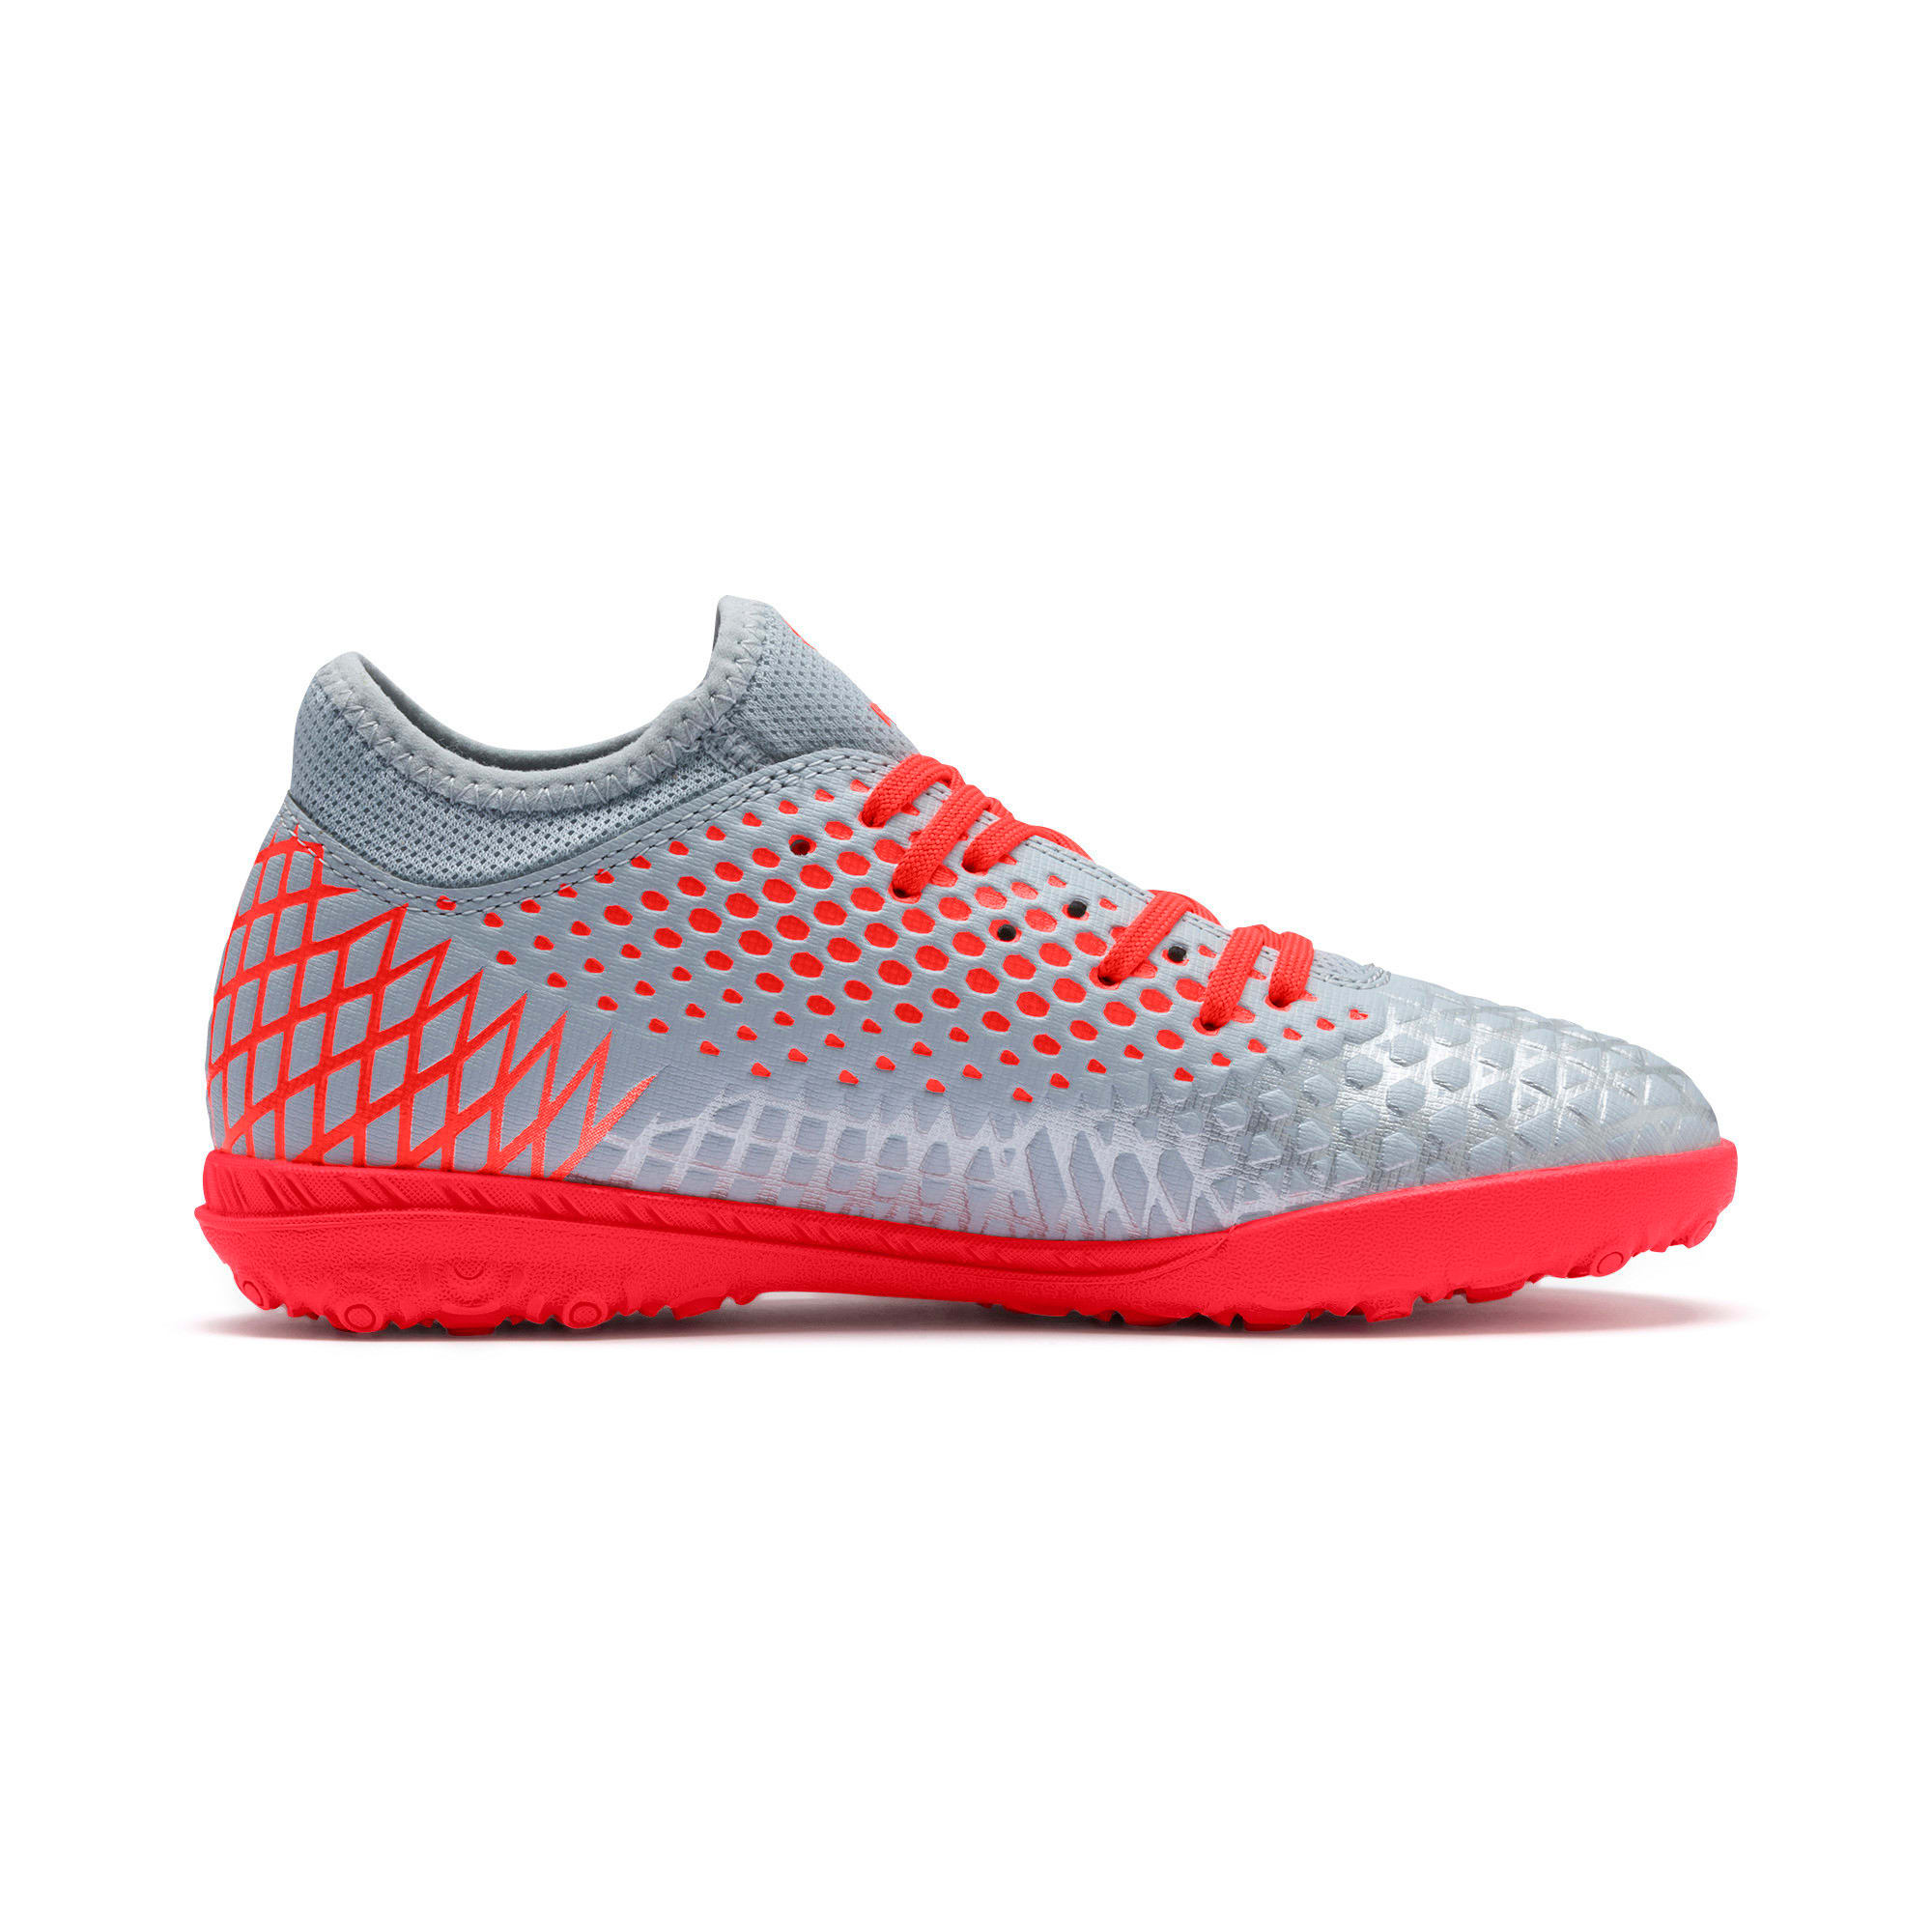 Thumbnail 5 of FUTURE 4.4 TT Soccer Shoes JR, Glacial Blue-Nrgy Red, medium